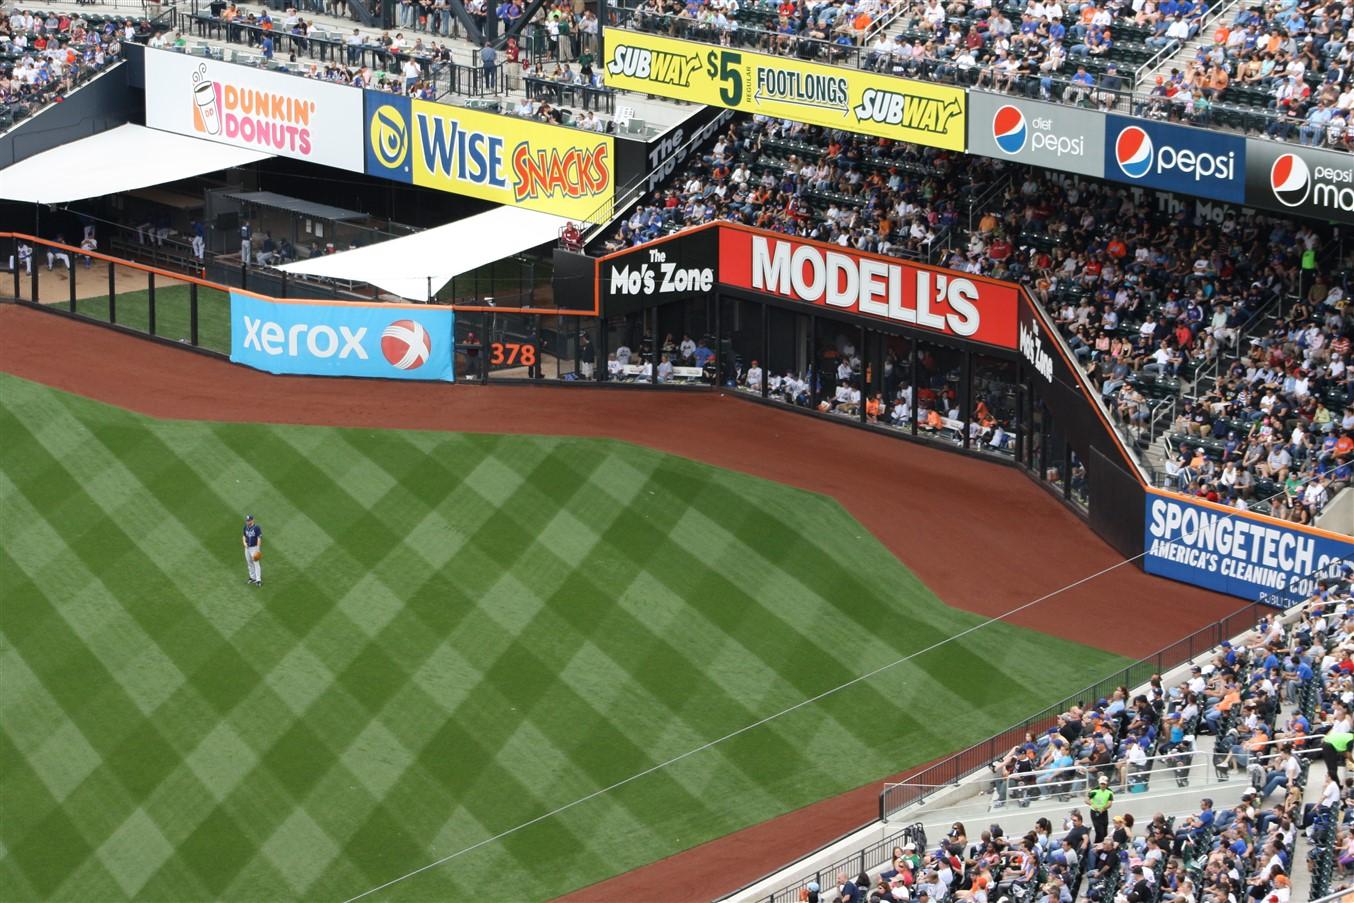 2009 06 21 Law School Road Trip Day 6 New York Mets 108.jpg